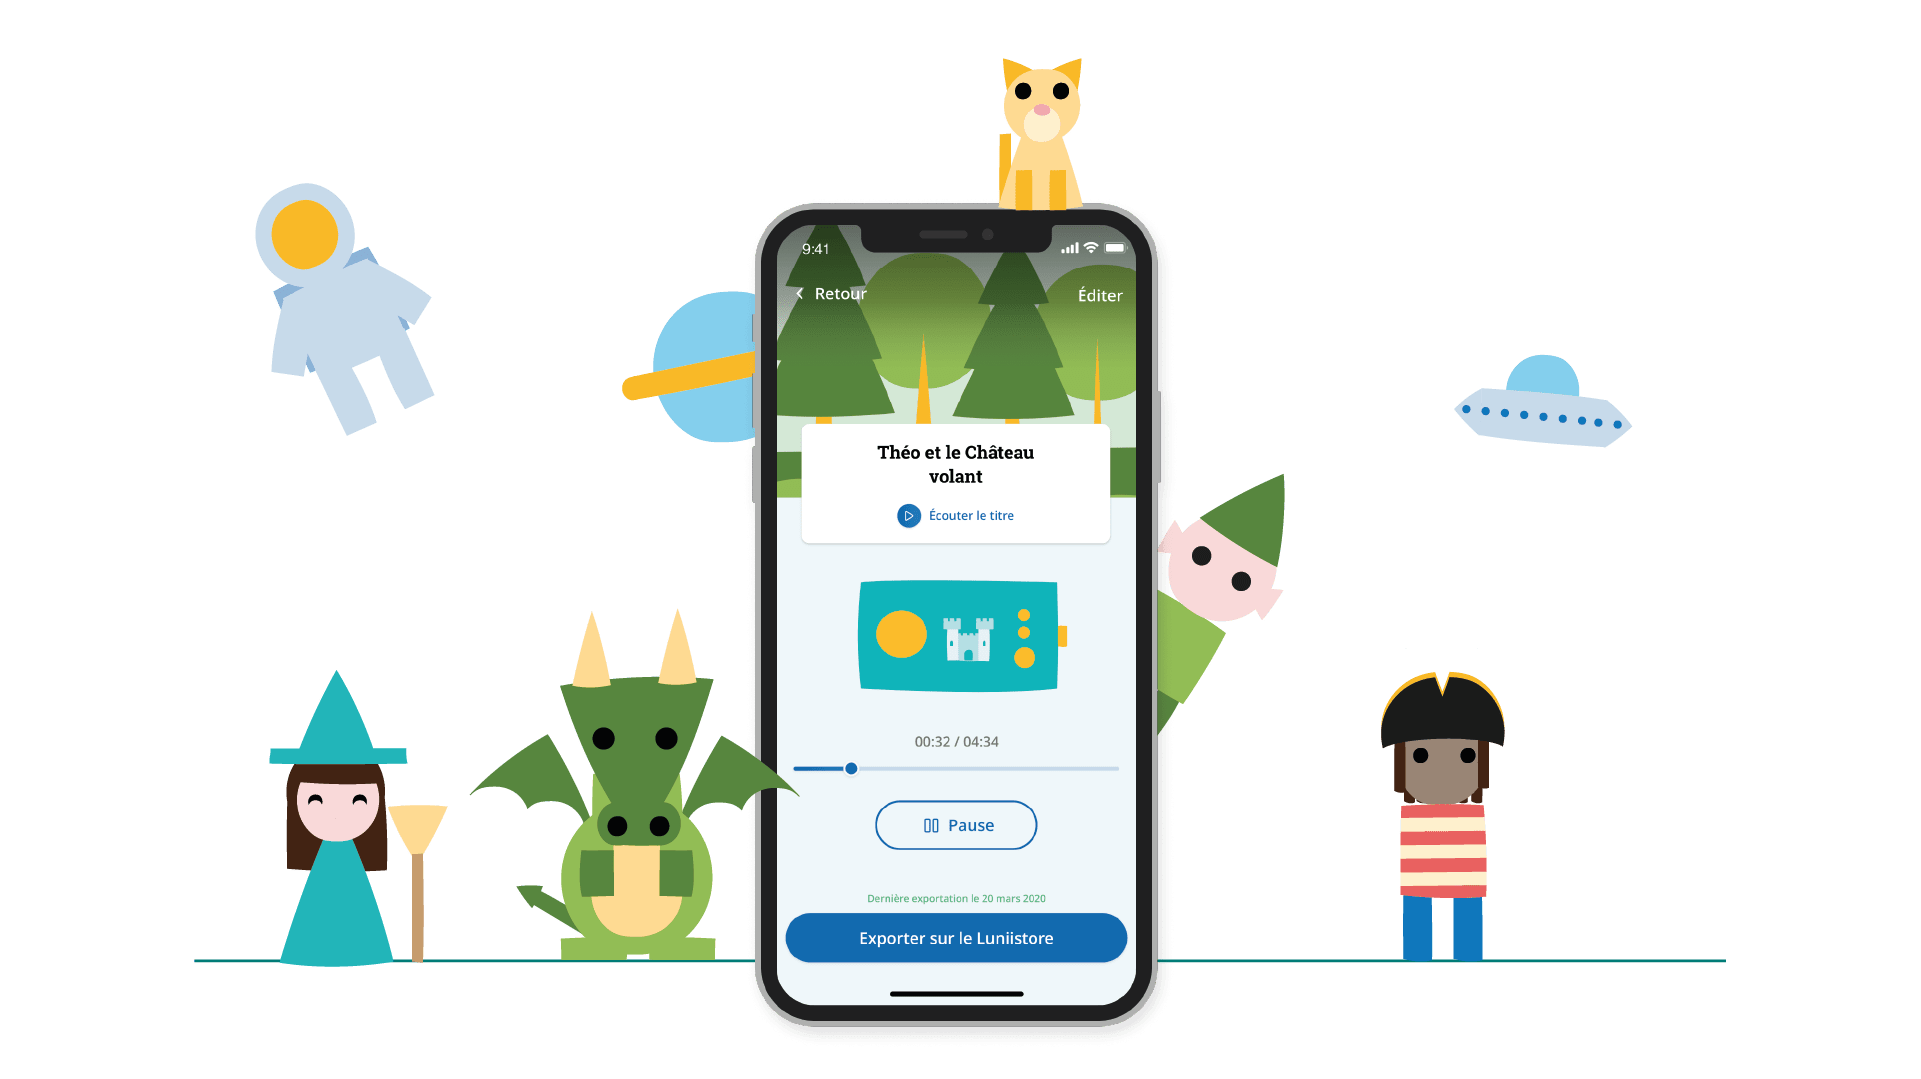 Application mobile Mon Studio Lunii - enregistrez vos propres histoires